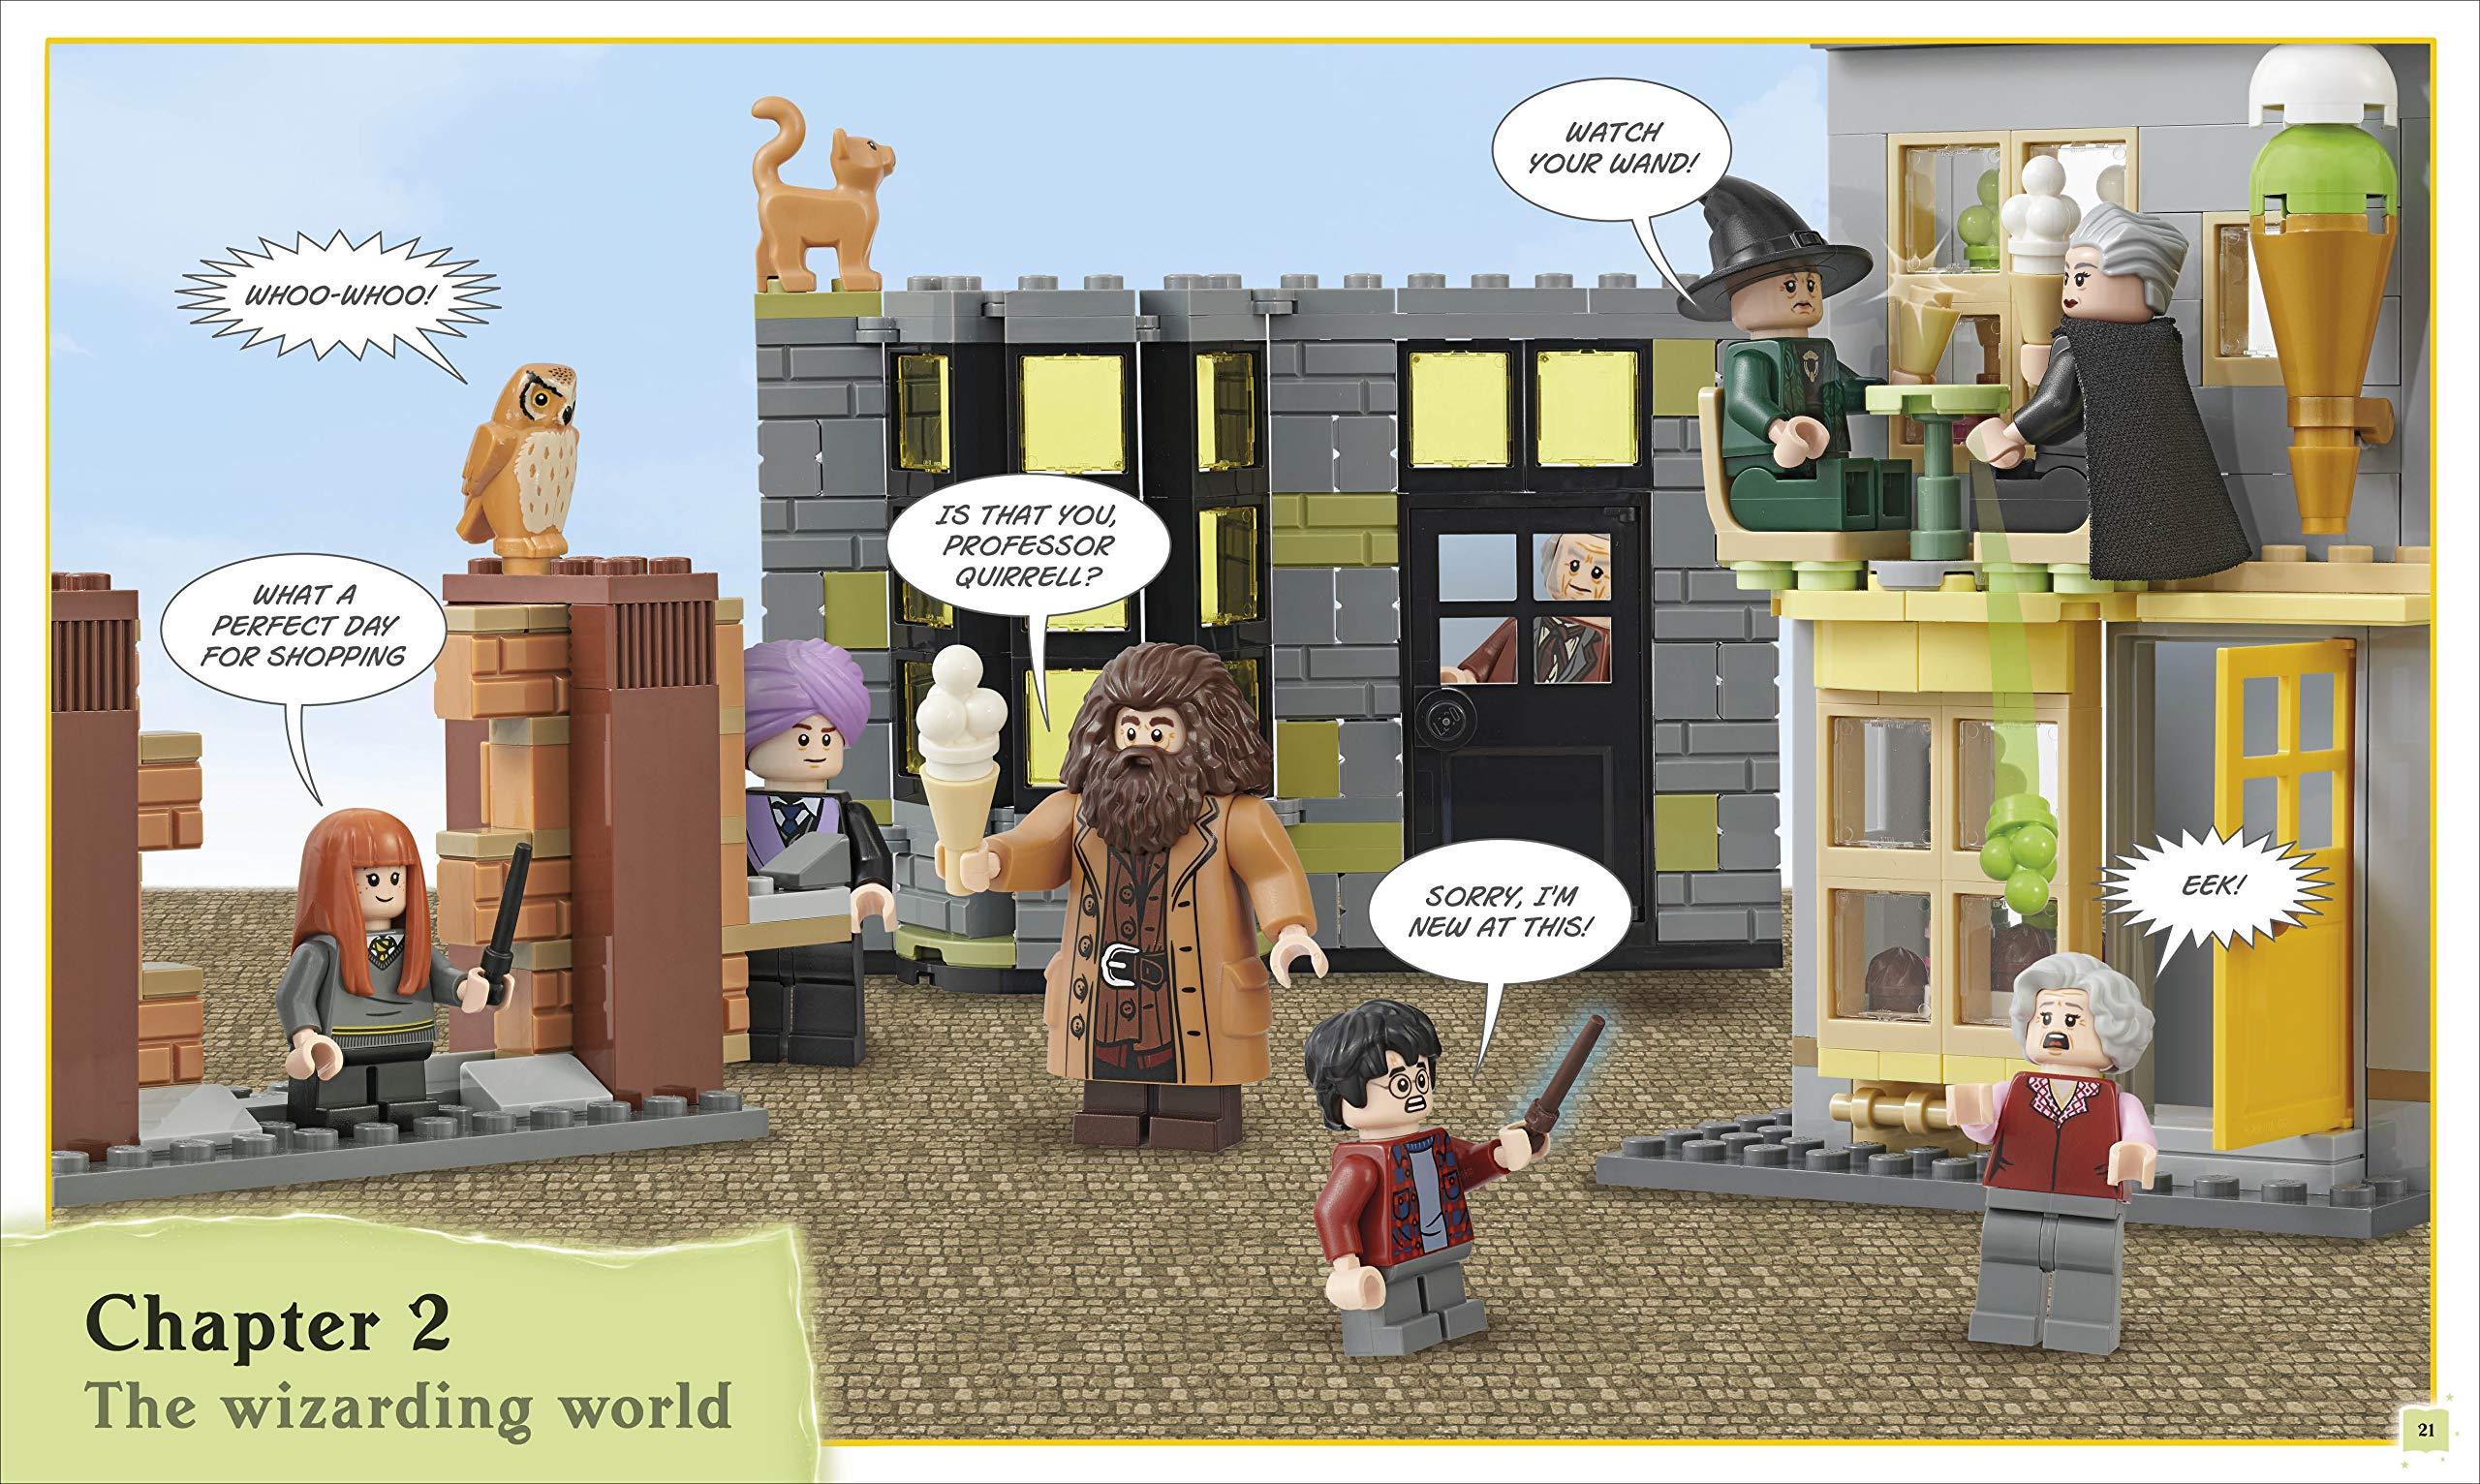 Construis ta propre aventure LEGO Harry Potter - Le Chemin de Traverse